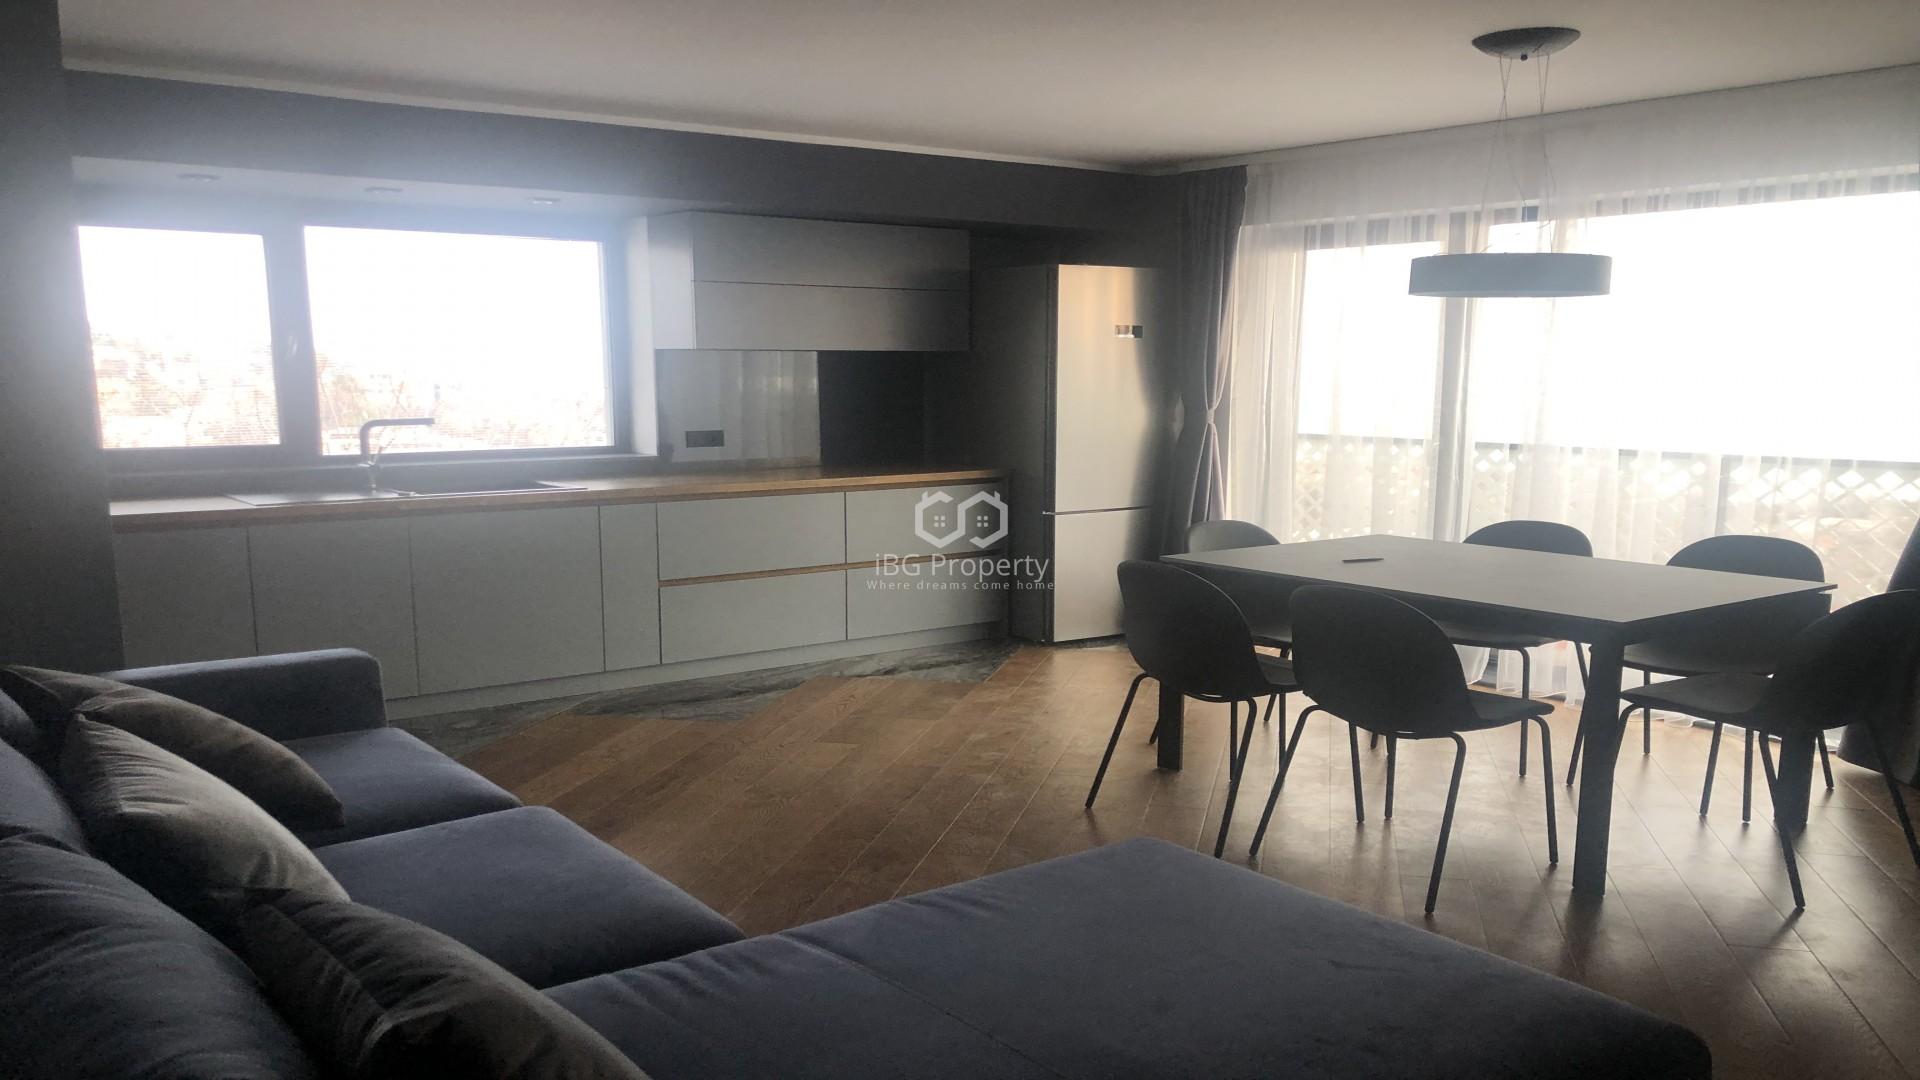 треххкомнатная квартира Варна 129 m2